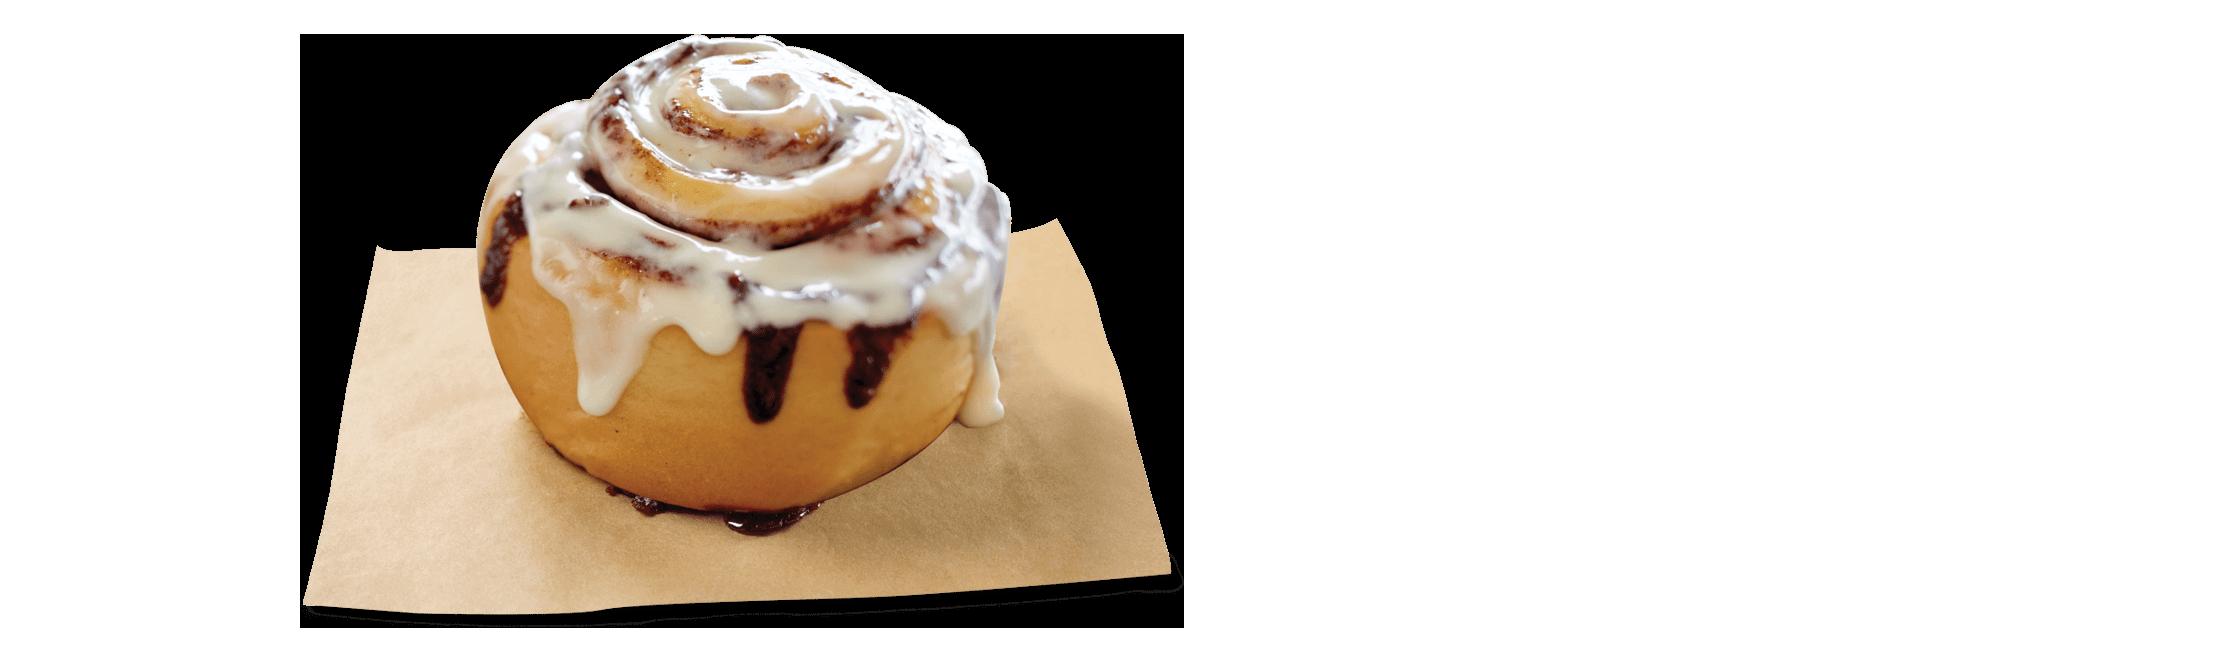 Cinnabon Bakery Menu: Cinnamon Rolls.